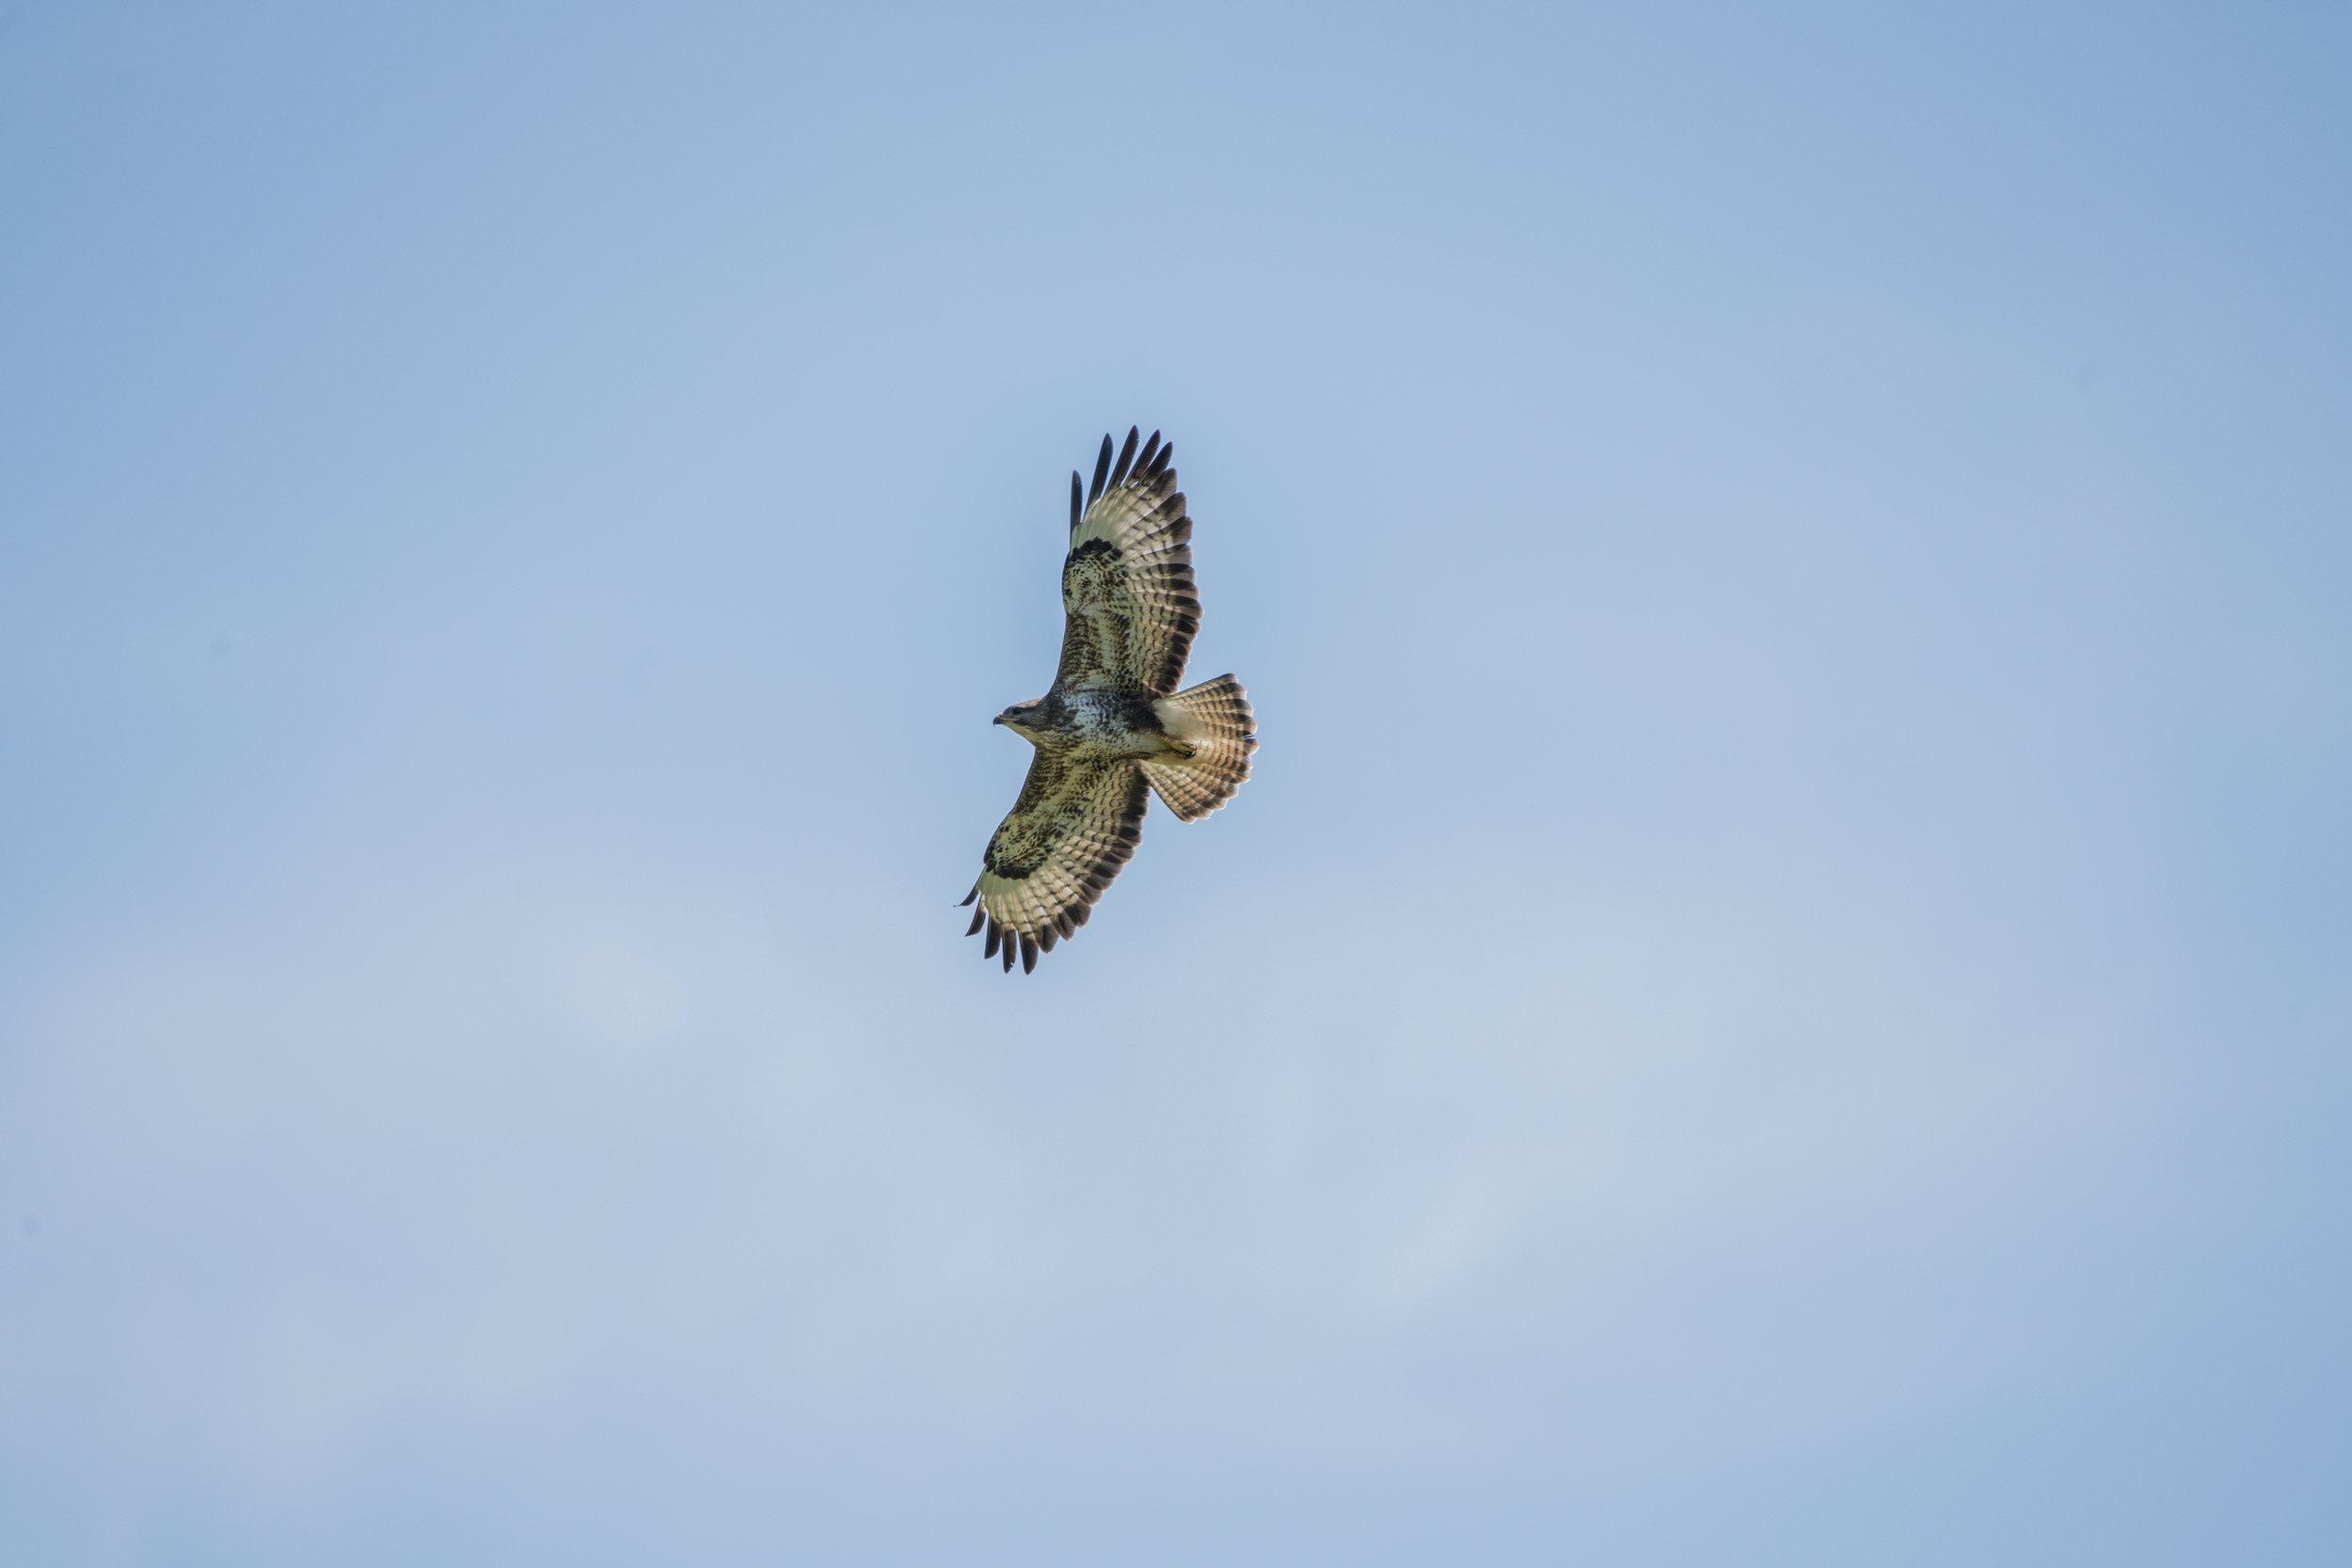 A buzzard soars overhead.